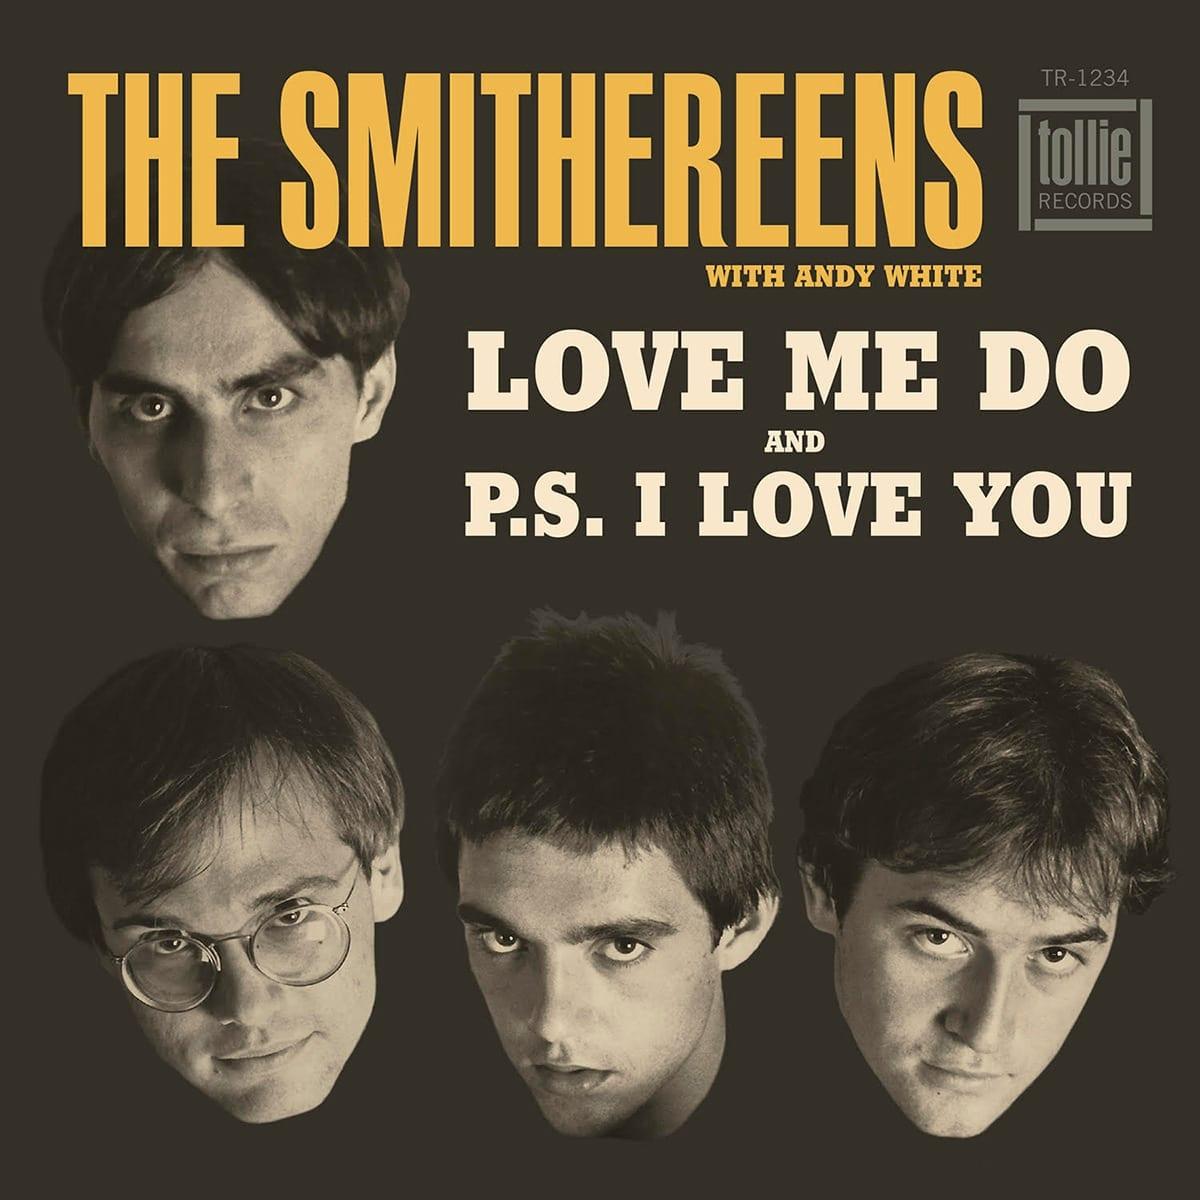 Smithereens Love Me Do 45 rpm vinyl sleeve